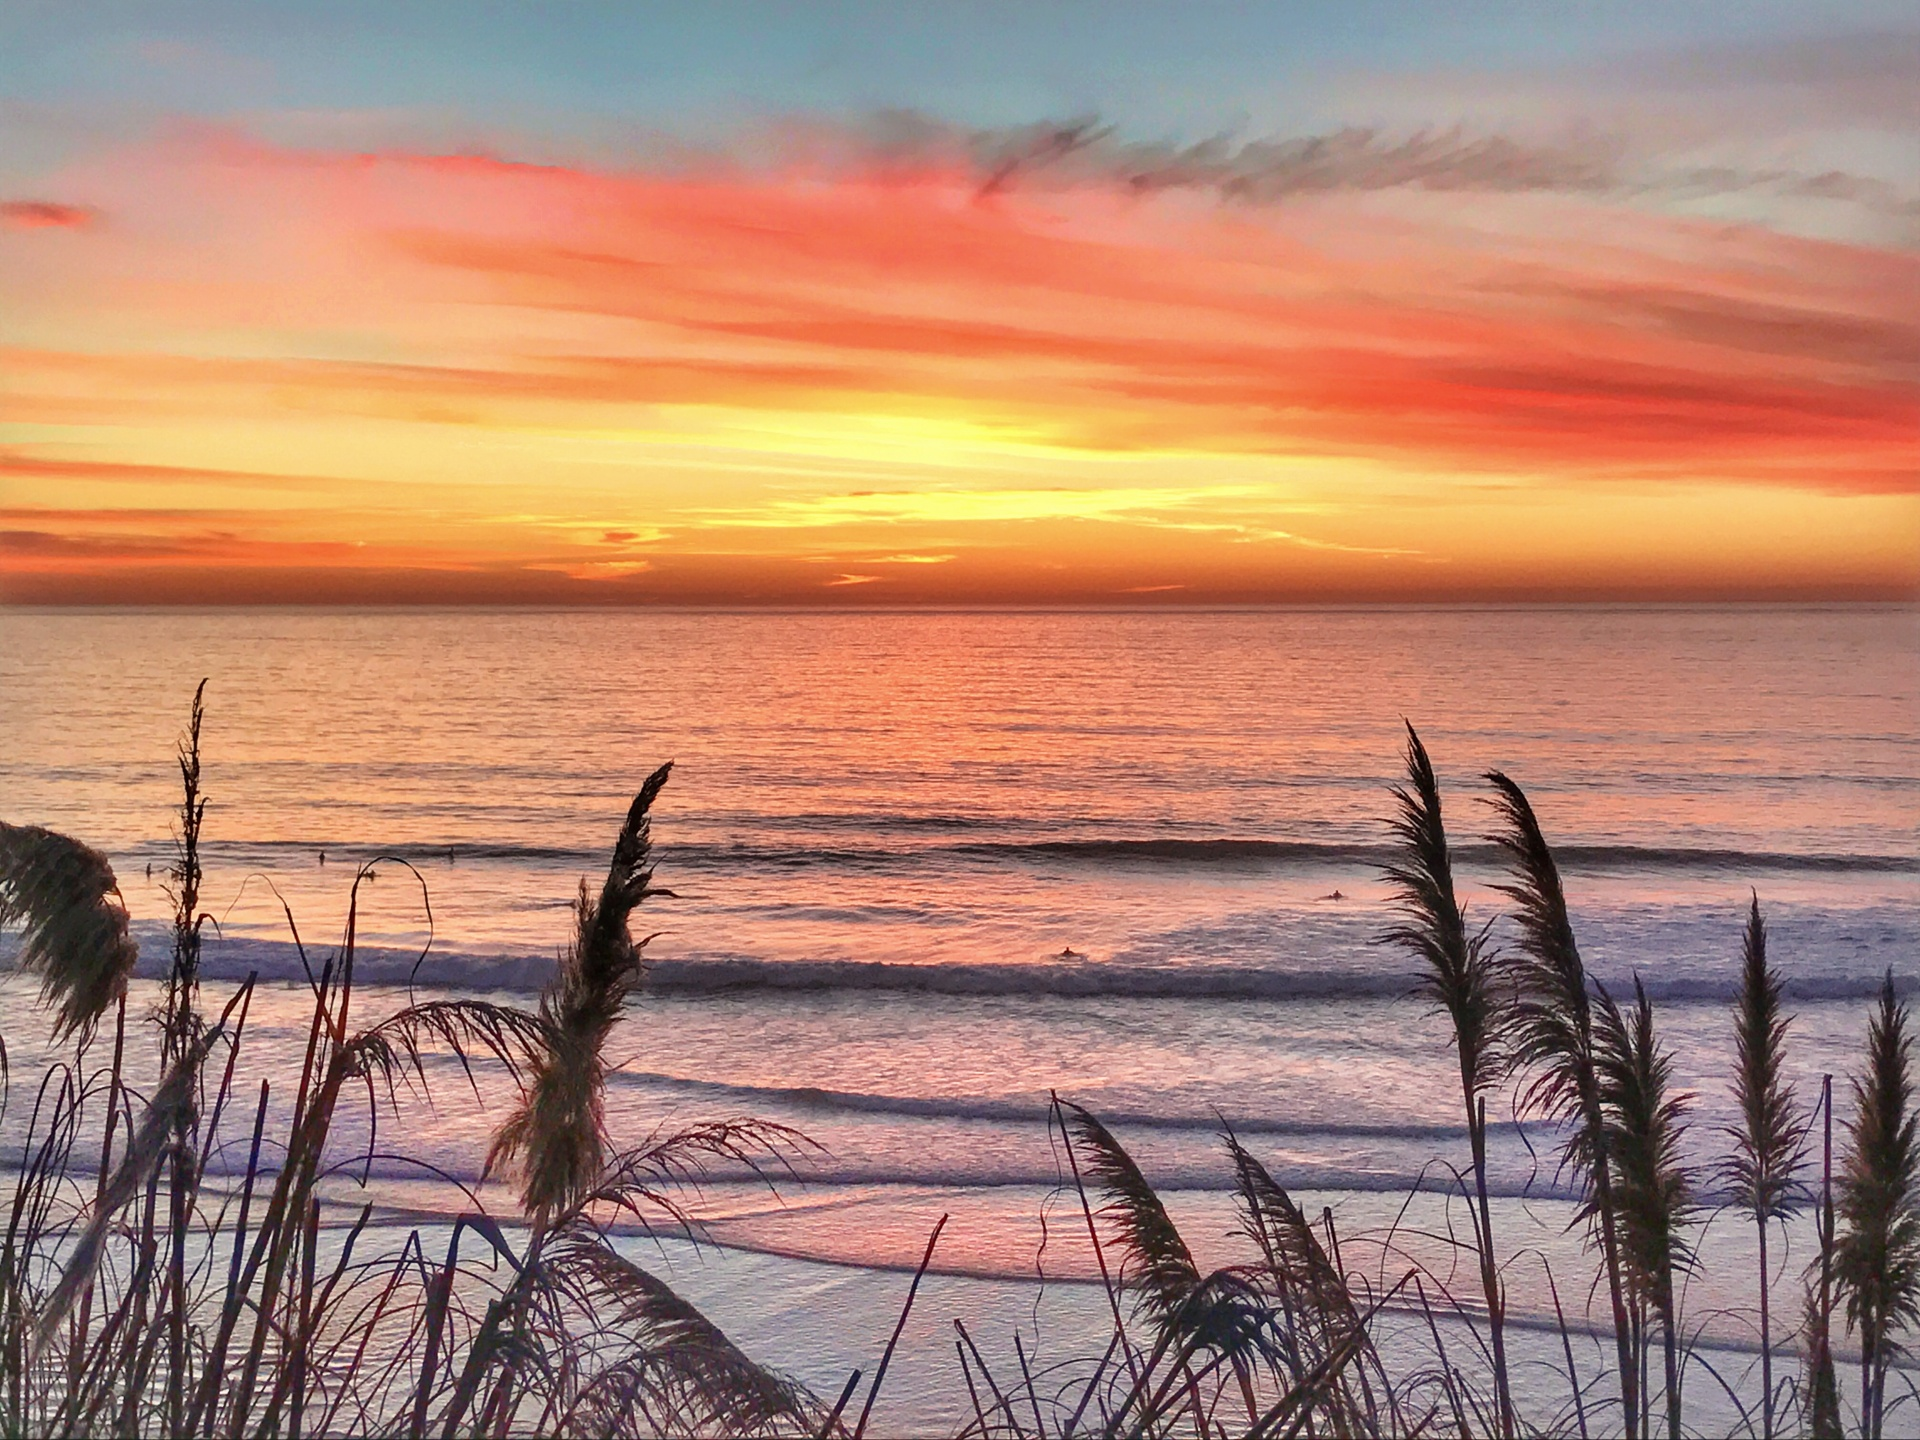 sunset-in-san-diego-cardiff-ca.jpg